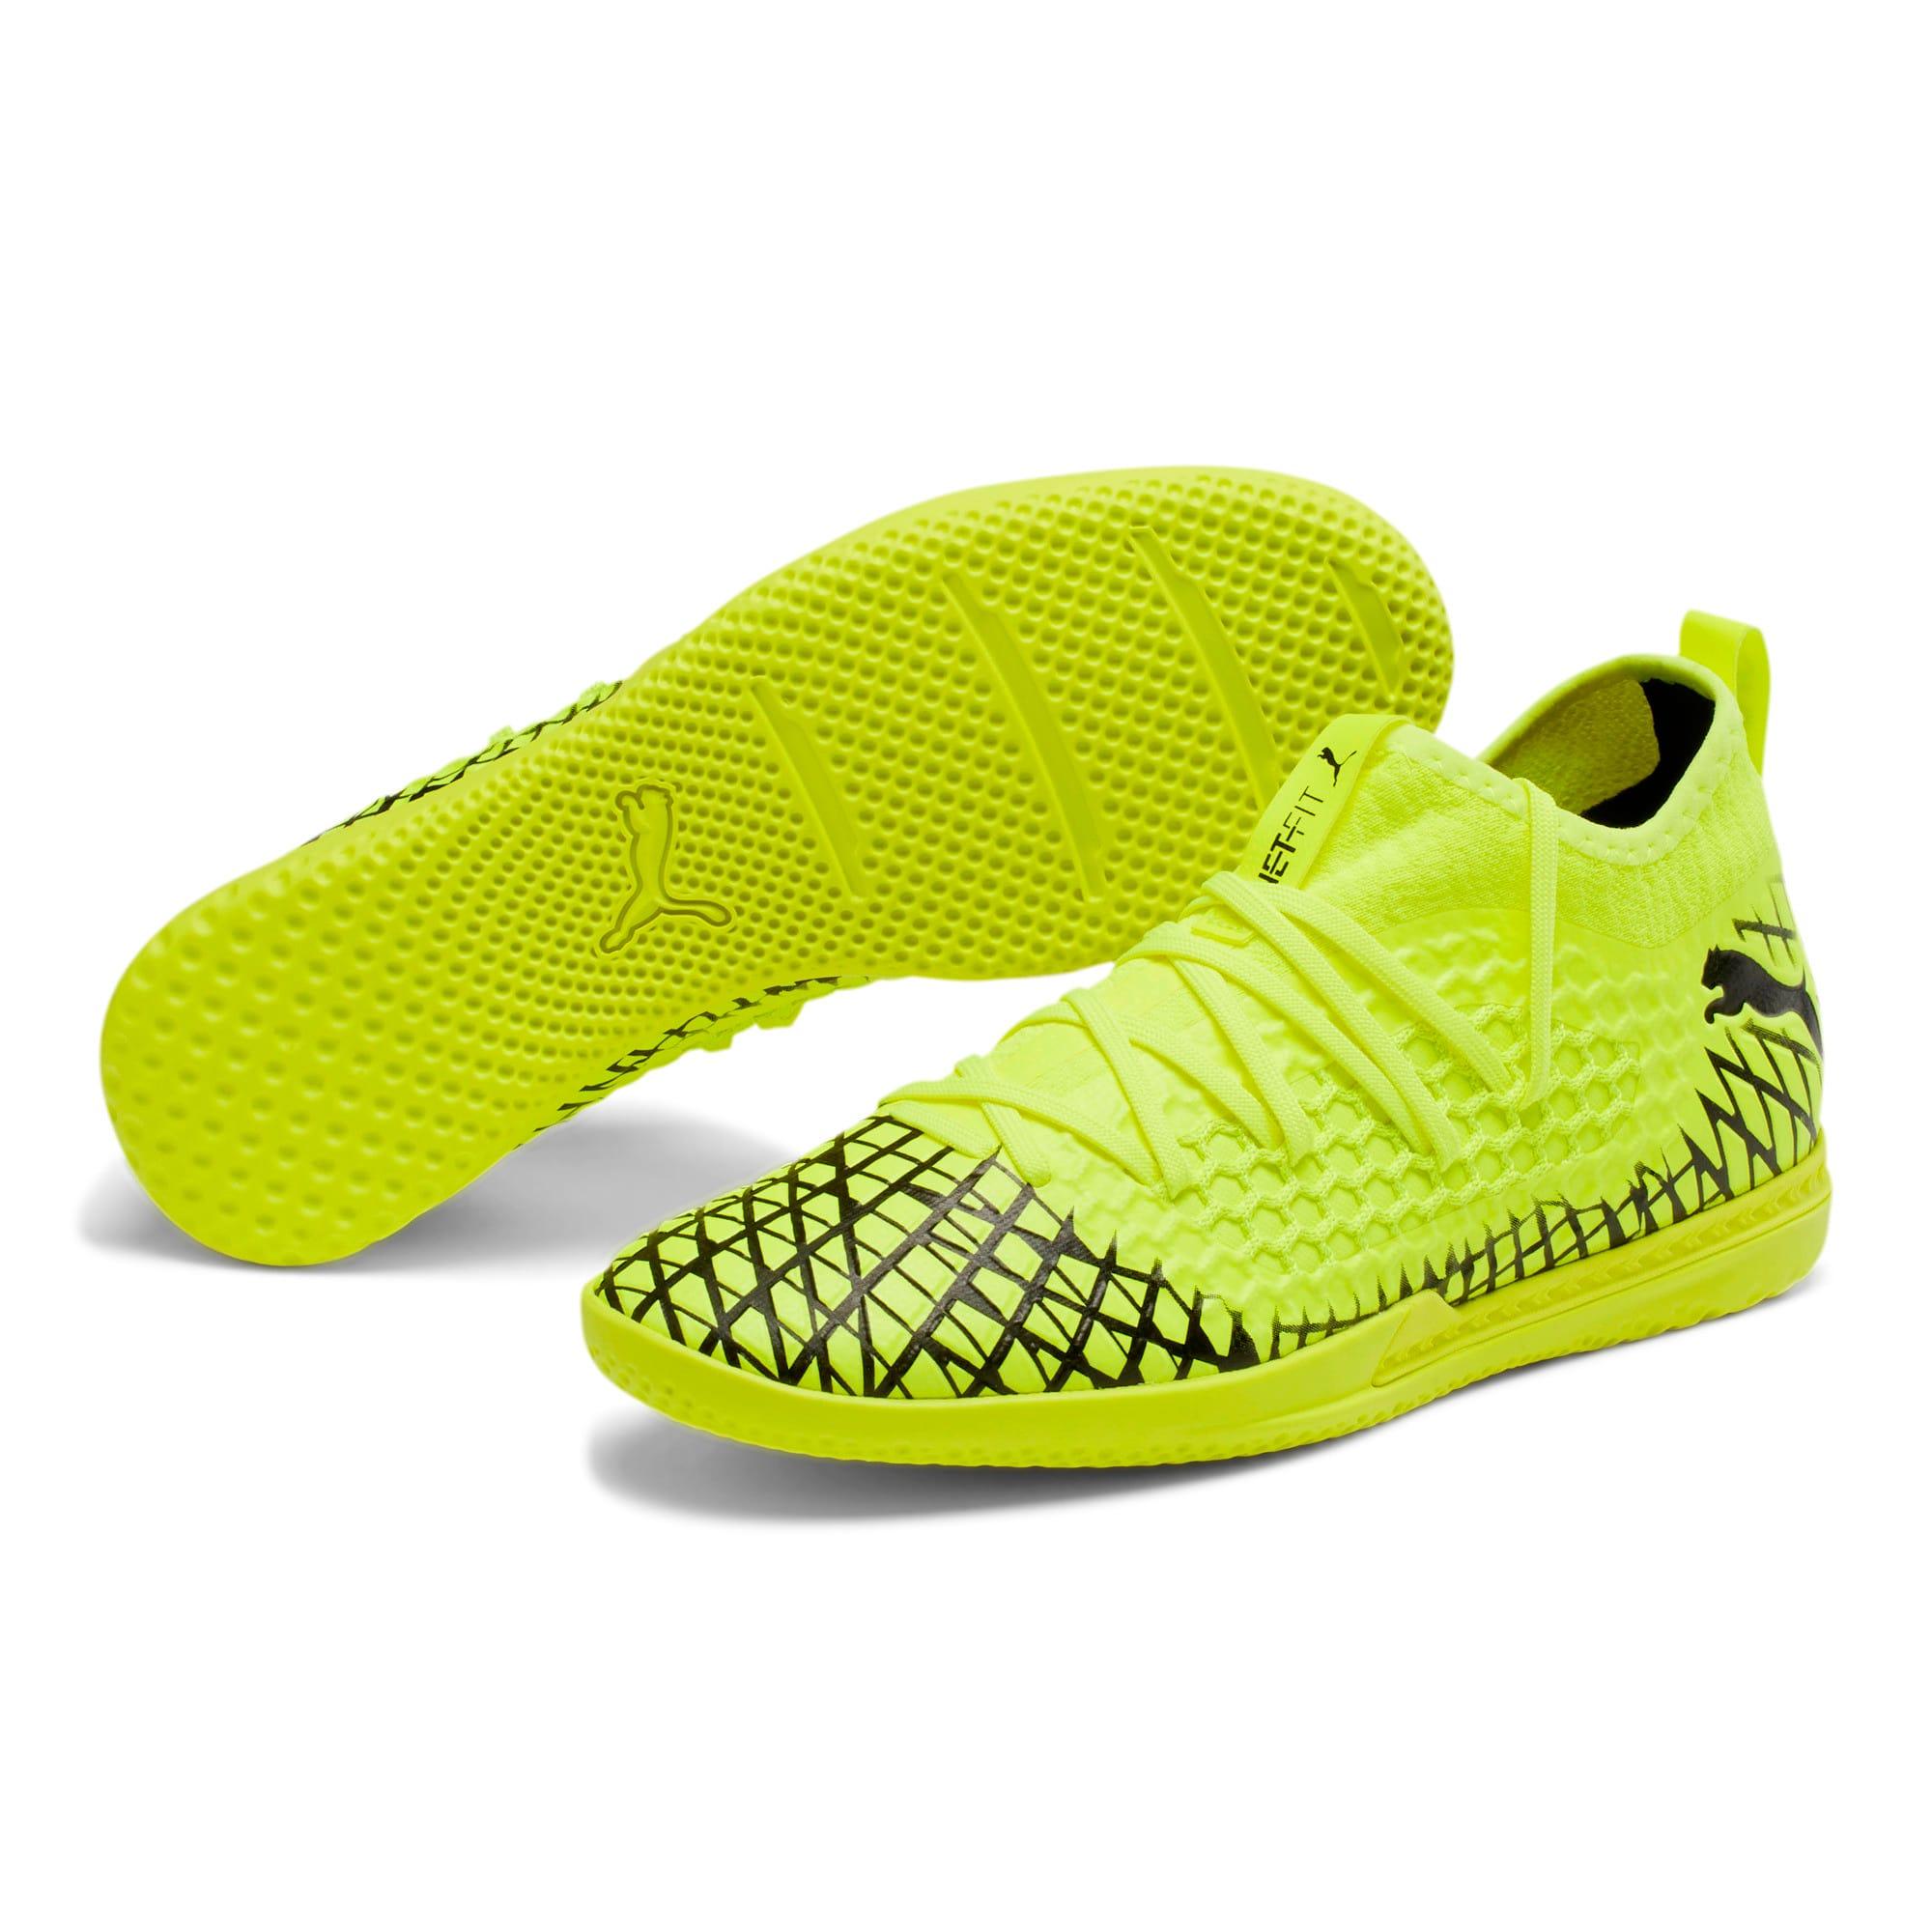 Thumbnail 3 of FUTURE 4.3 NETFIT IT Men's Soccer Shoes, Yellow Alert-Puma Black, medium